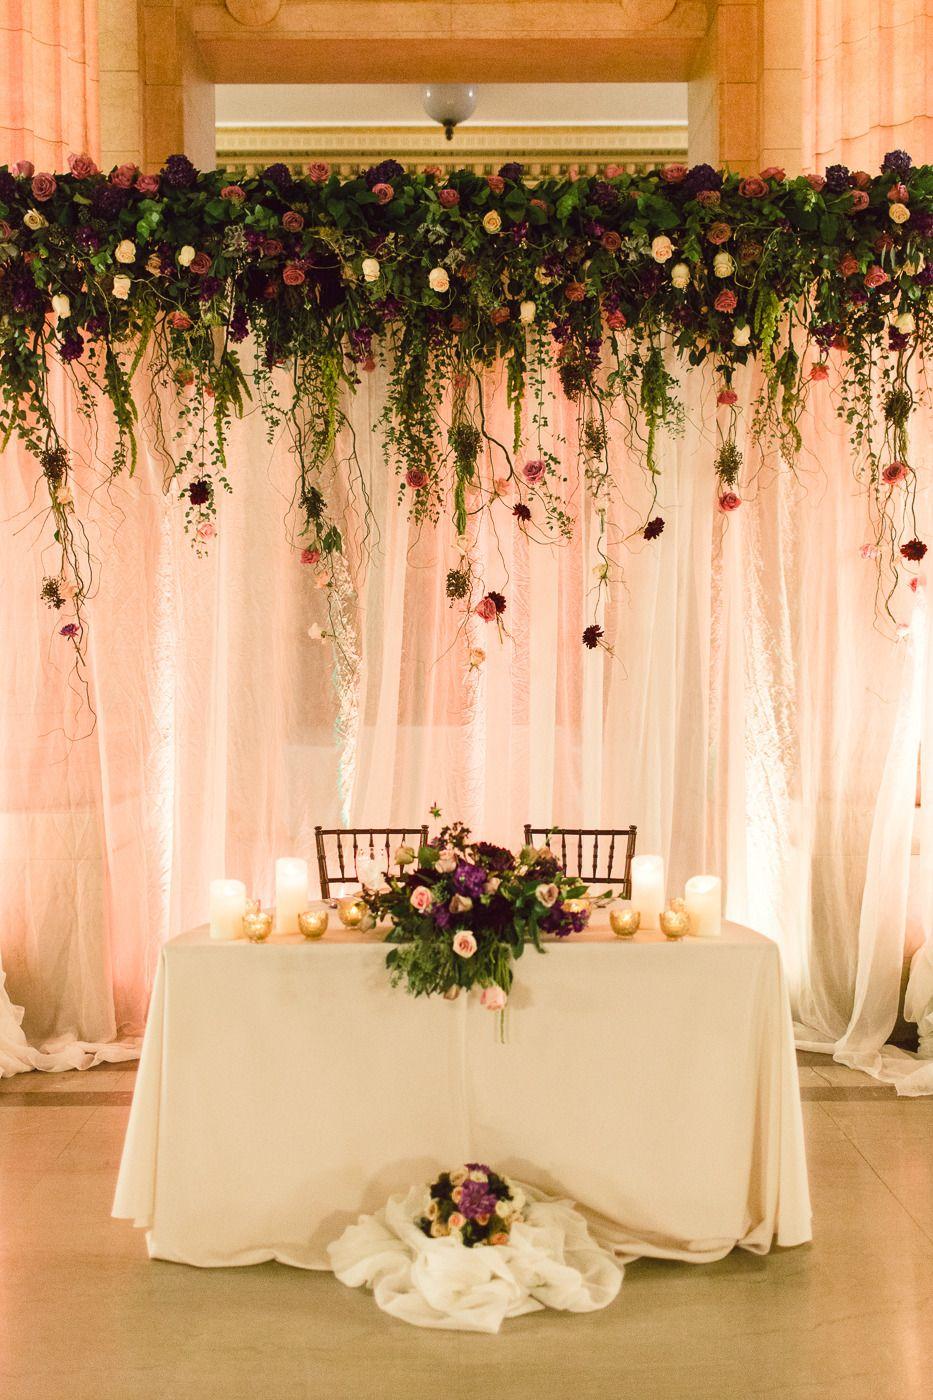 Cleveland City Hall Rotunda Wedding Wedding Decorations Elegant Purple Wedding Decor Elegant Fun Wedding Decor